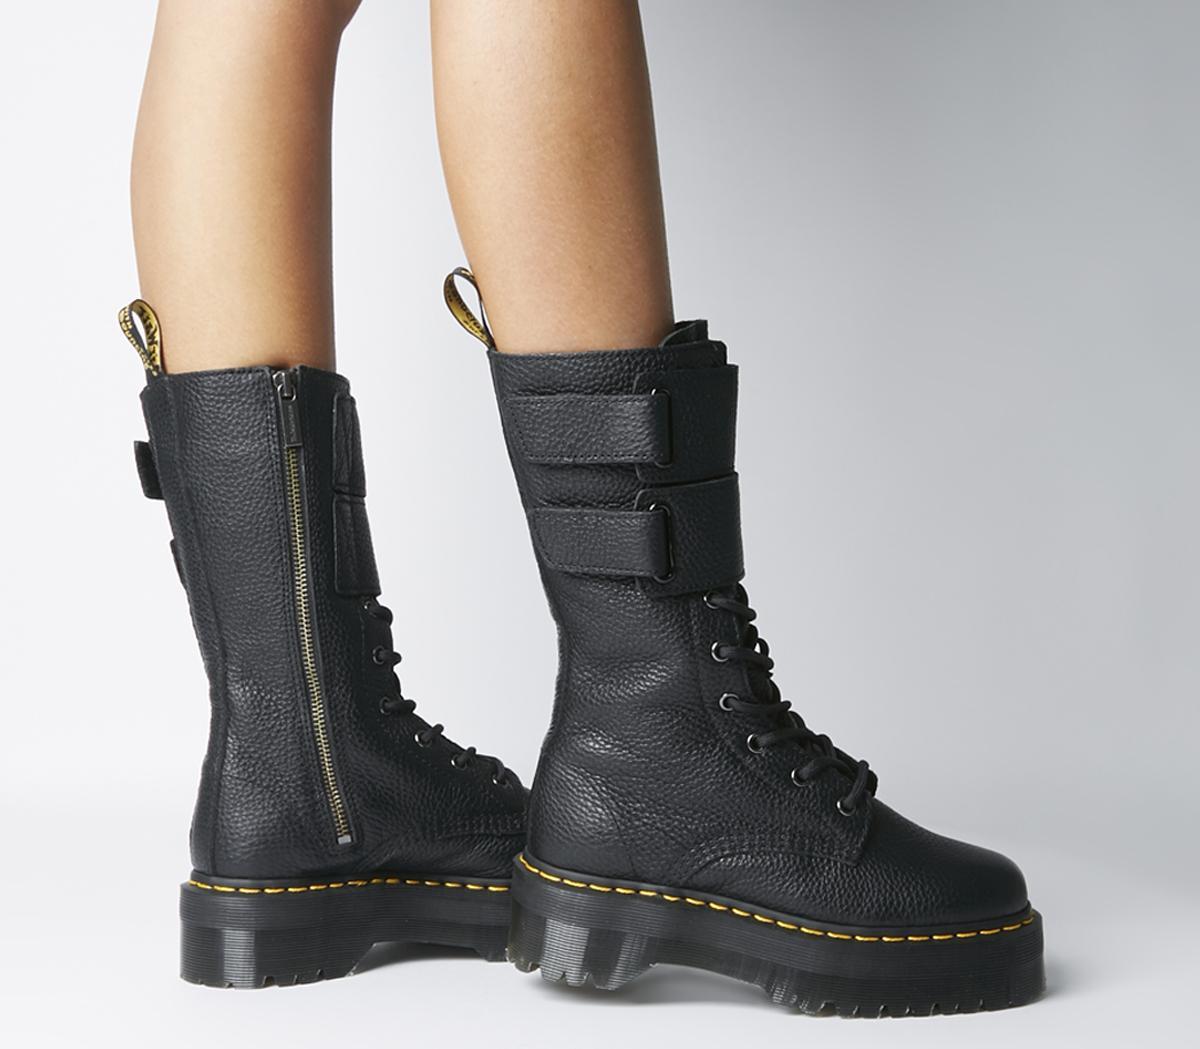 doc martins platform boots